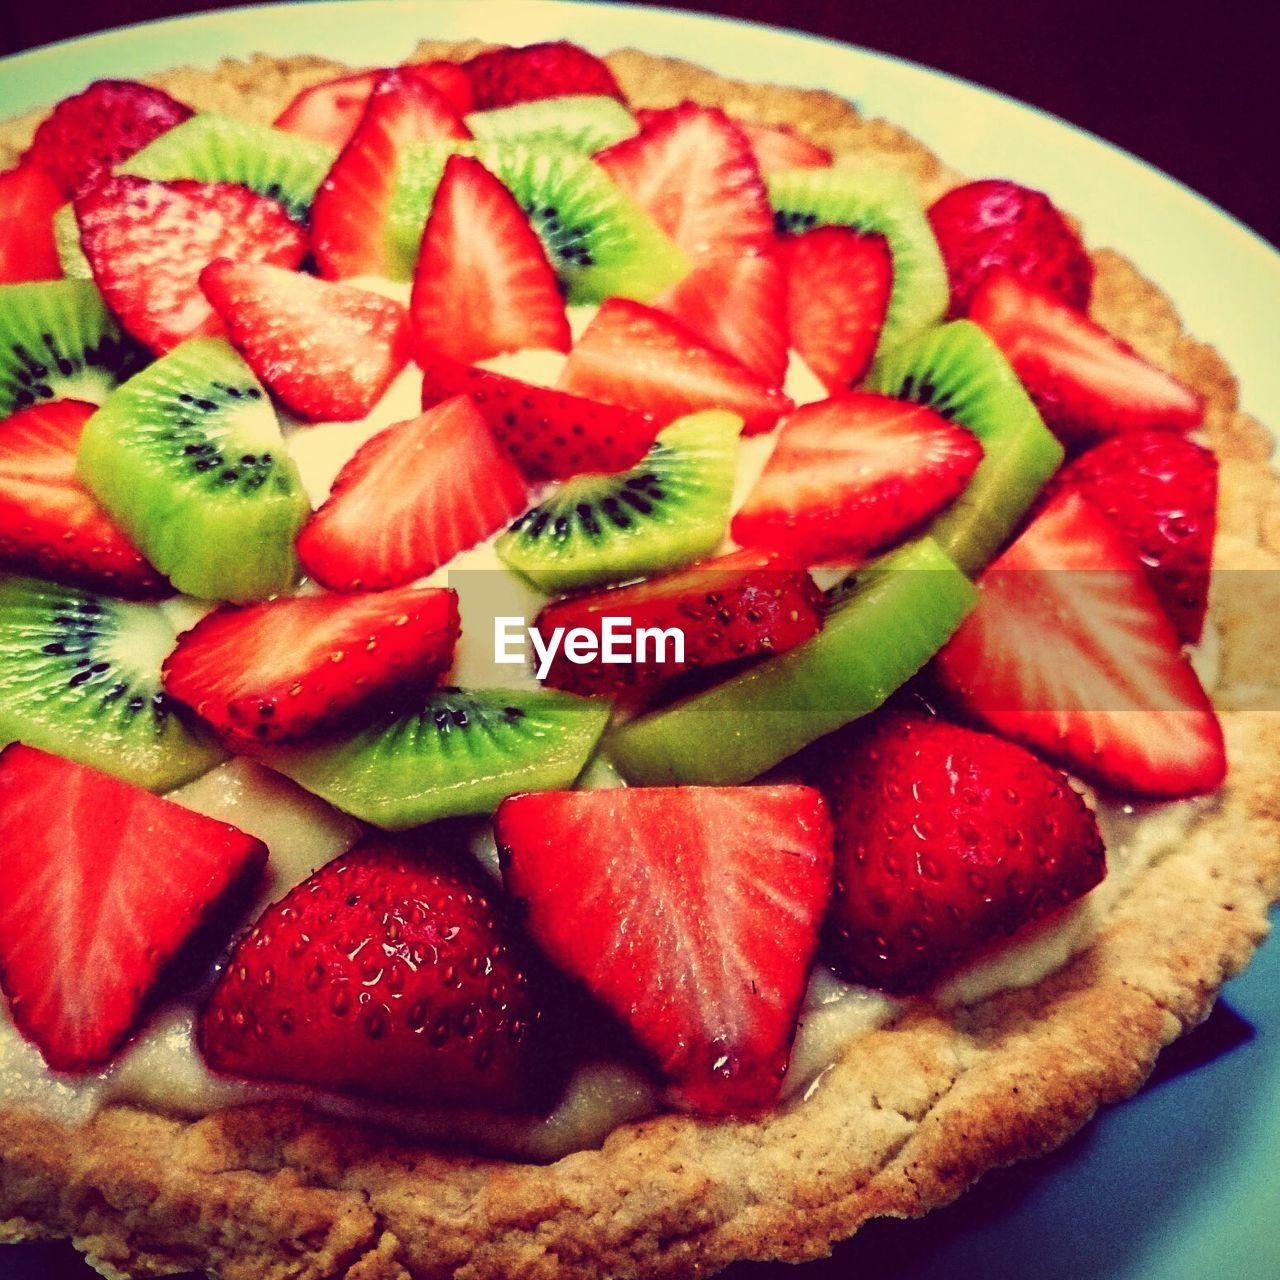 strawberry, food, food and drink, fruit, freshness, ready-to-eat, still life, slice, berry fruit, sweet food, cake, dessert, indoors, indulgence, plate, close-up, serving size, red, baked, no people, raspberry, tart - dessert, fruitcake, healthy eating, temptation, sponge cake